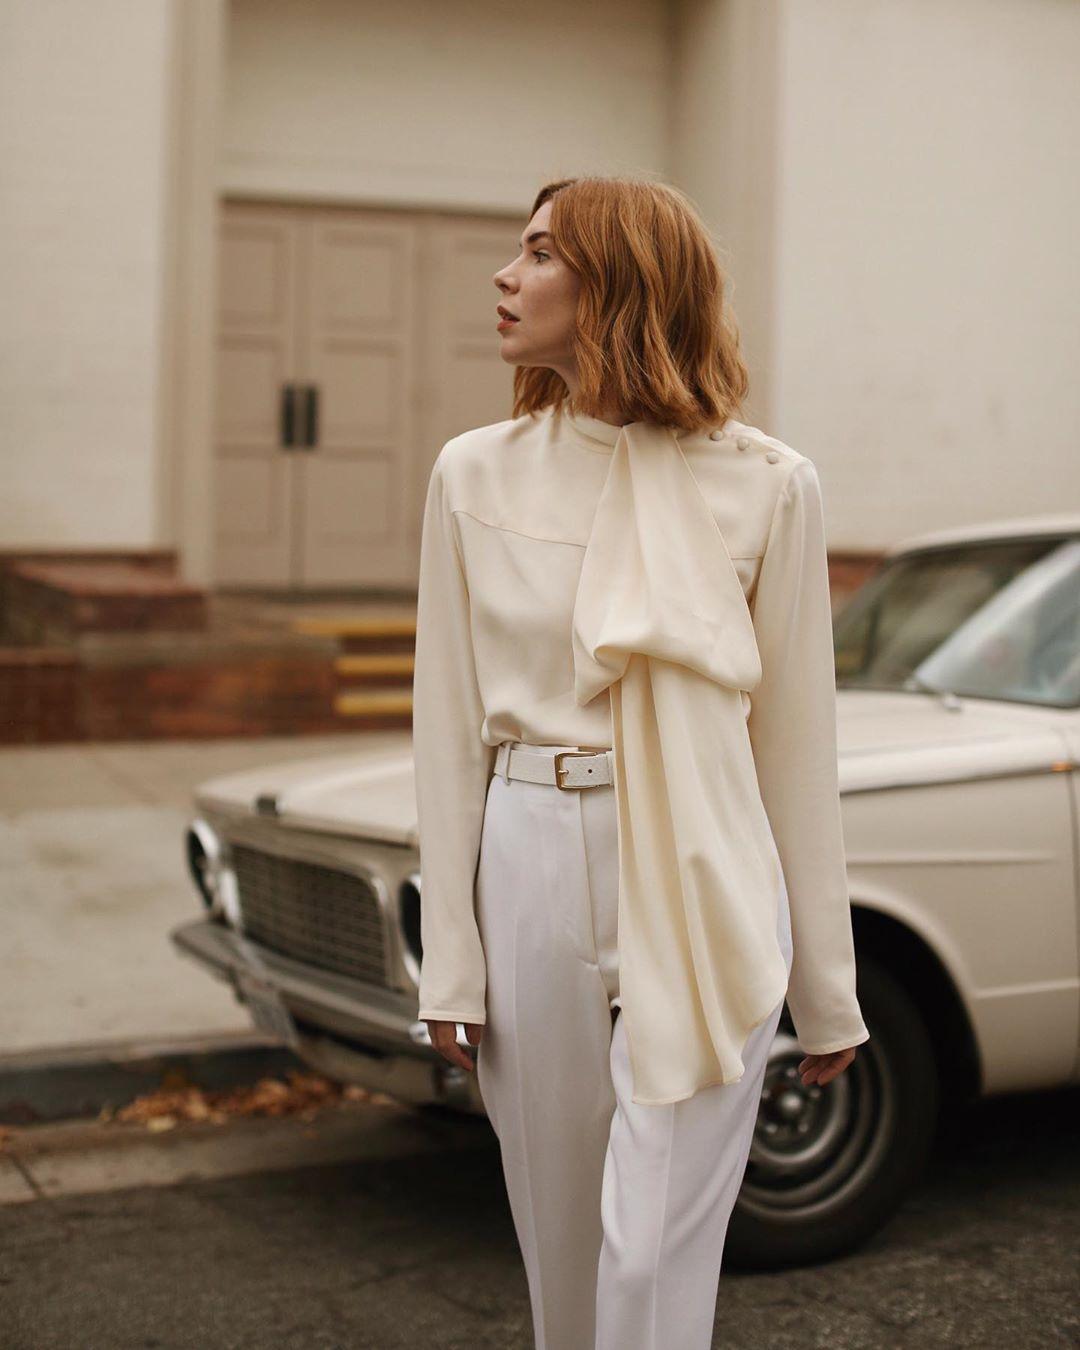 Dress code formal - áo sơ mi voan cổ điển